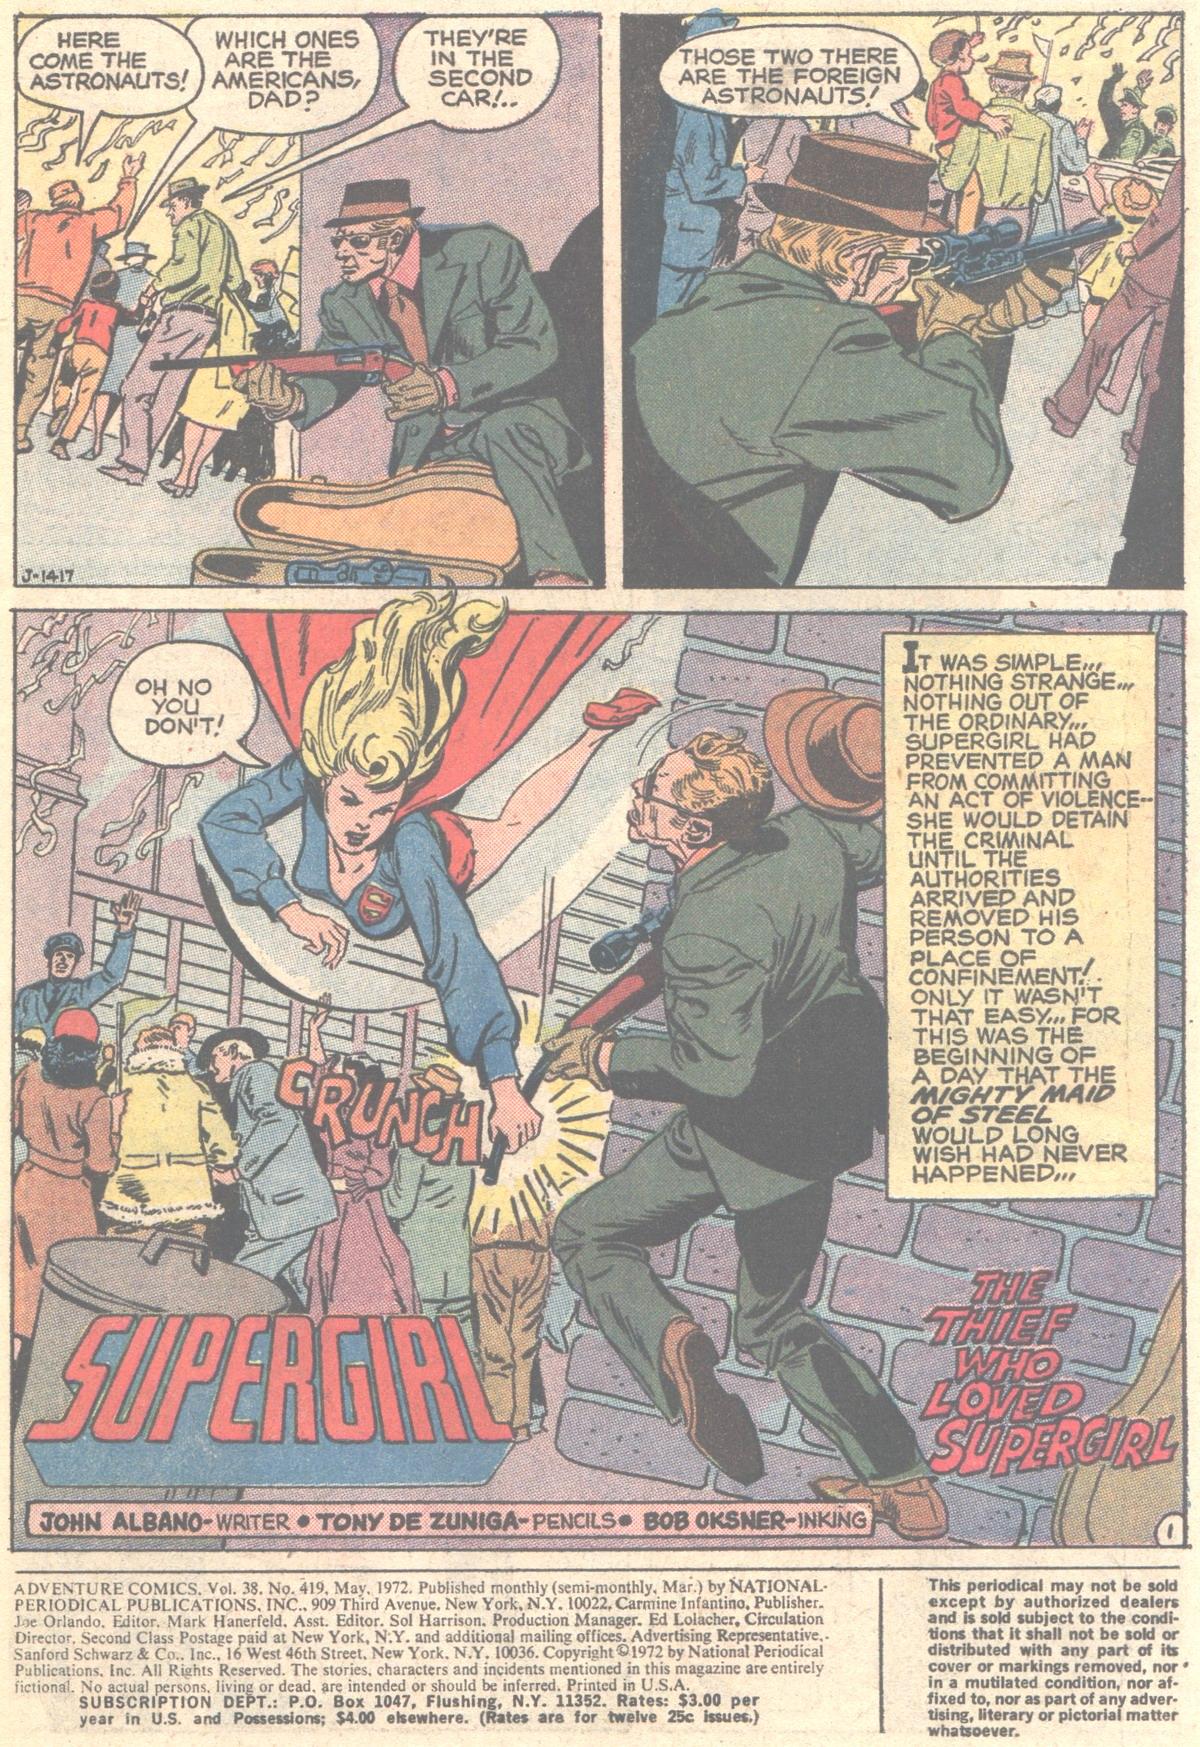 Read online Adventure Comics (1938) comic -  Issue #419 - 3